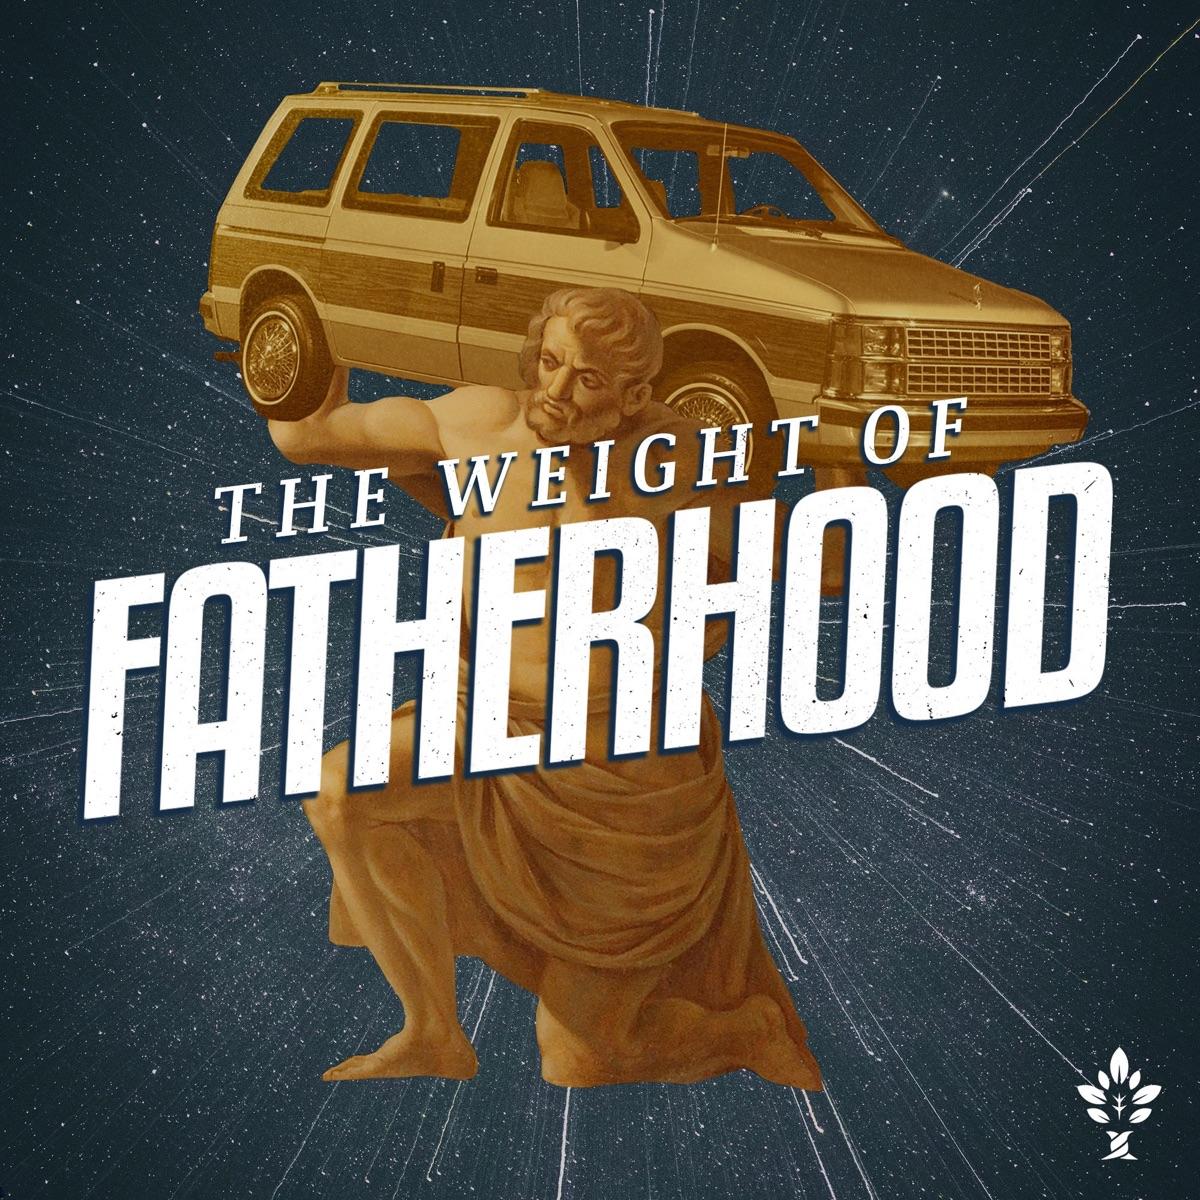 The Weight of Fatherhood